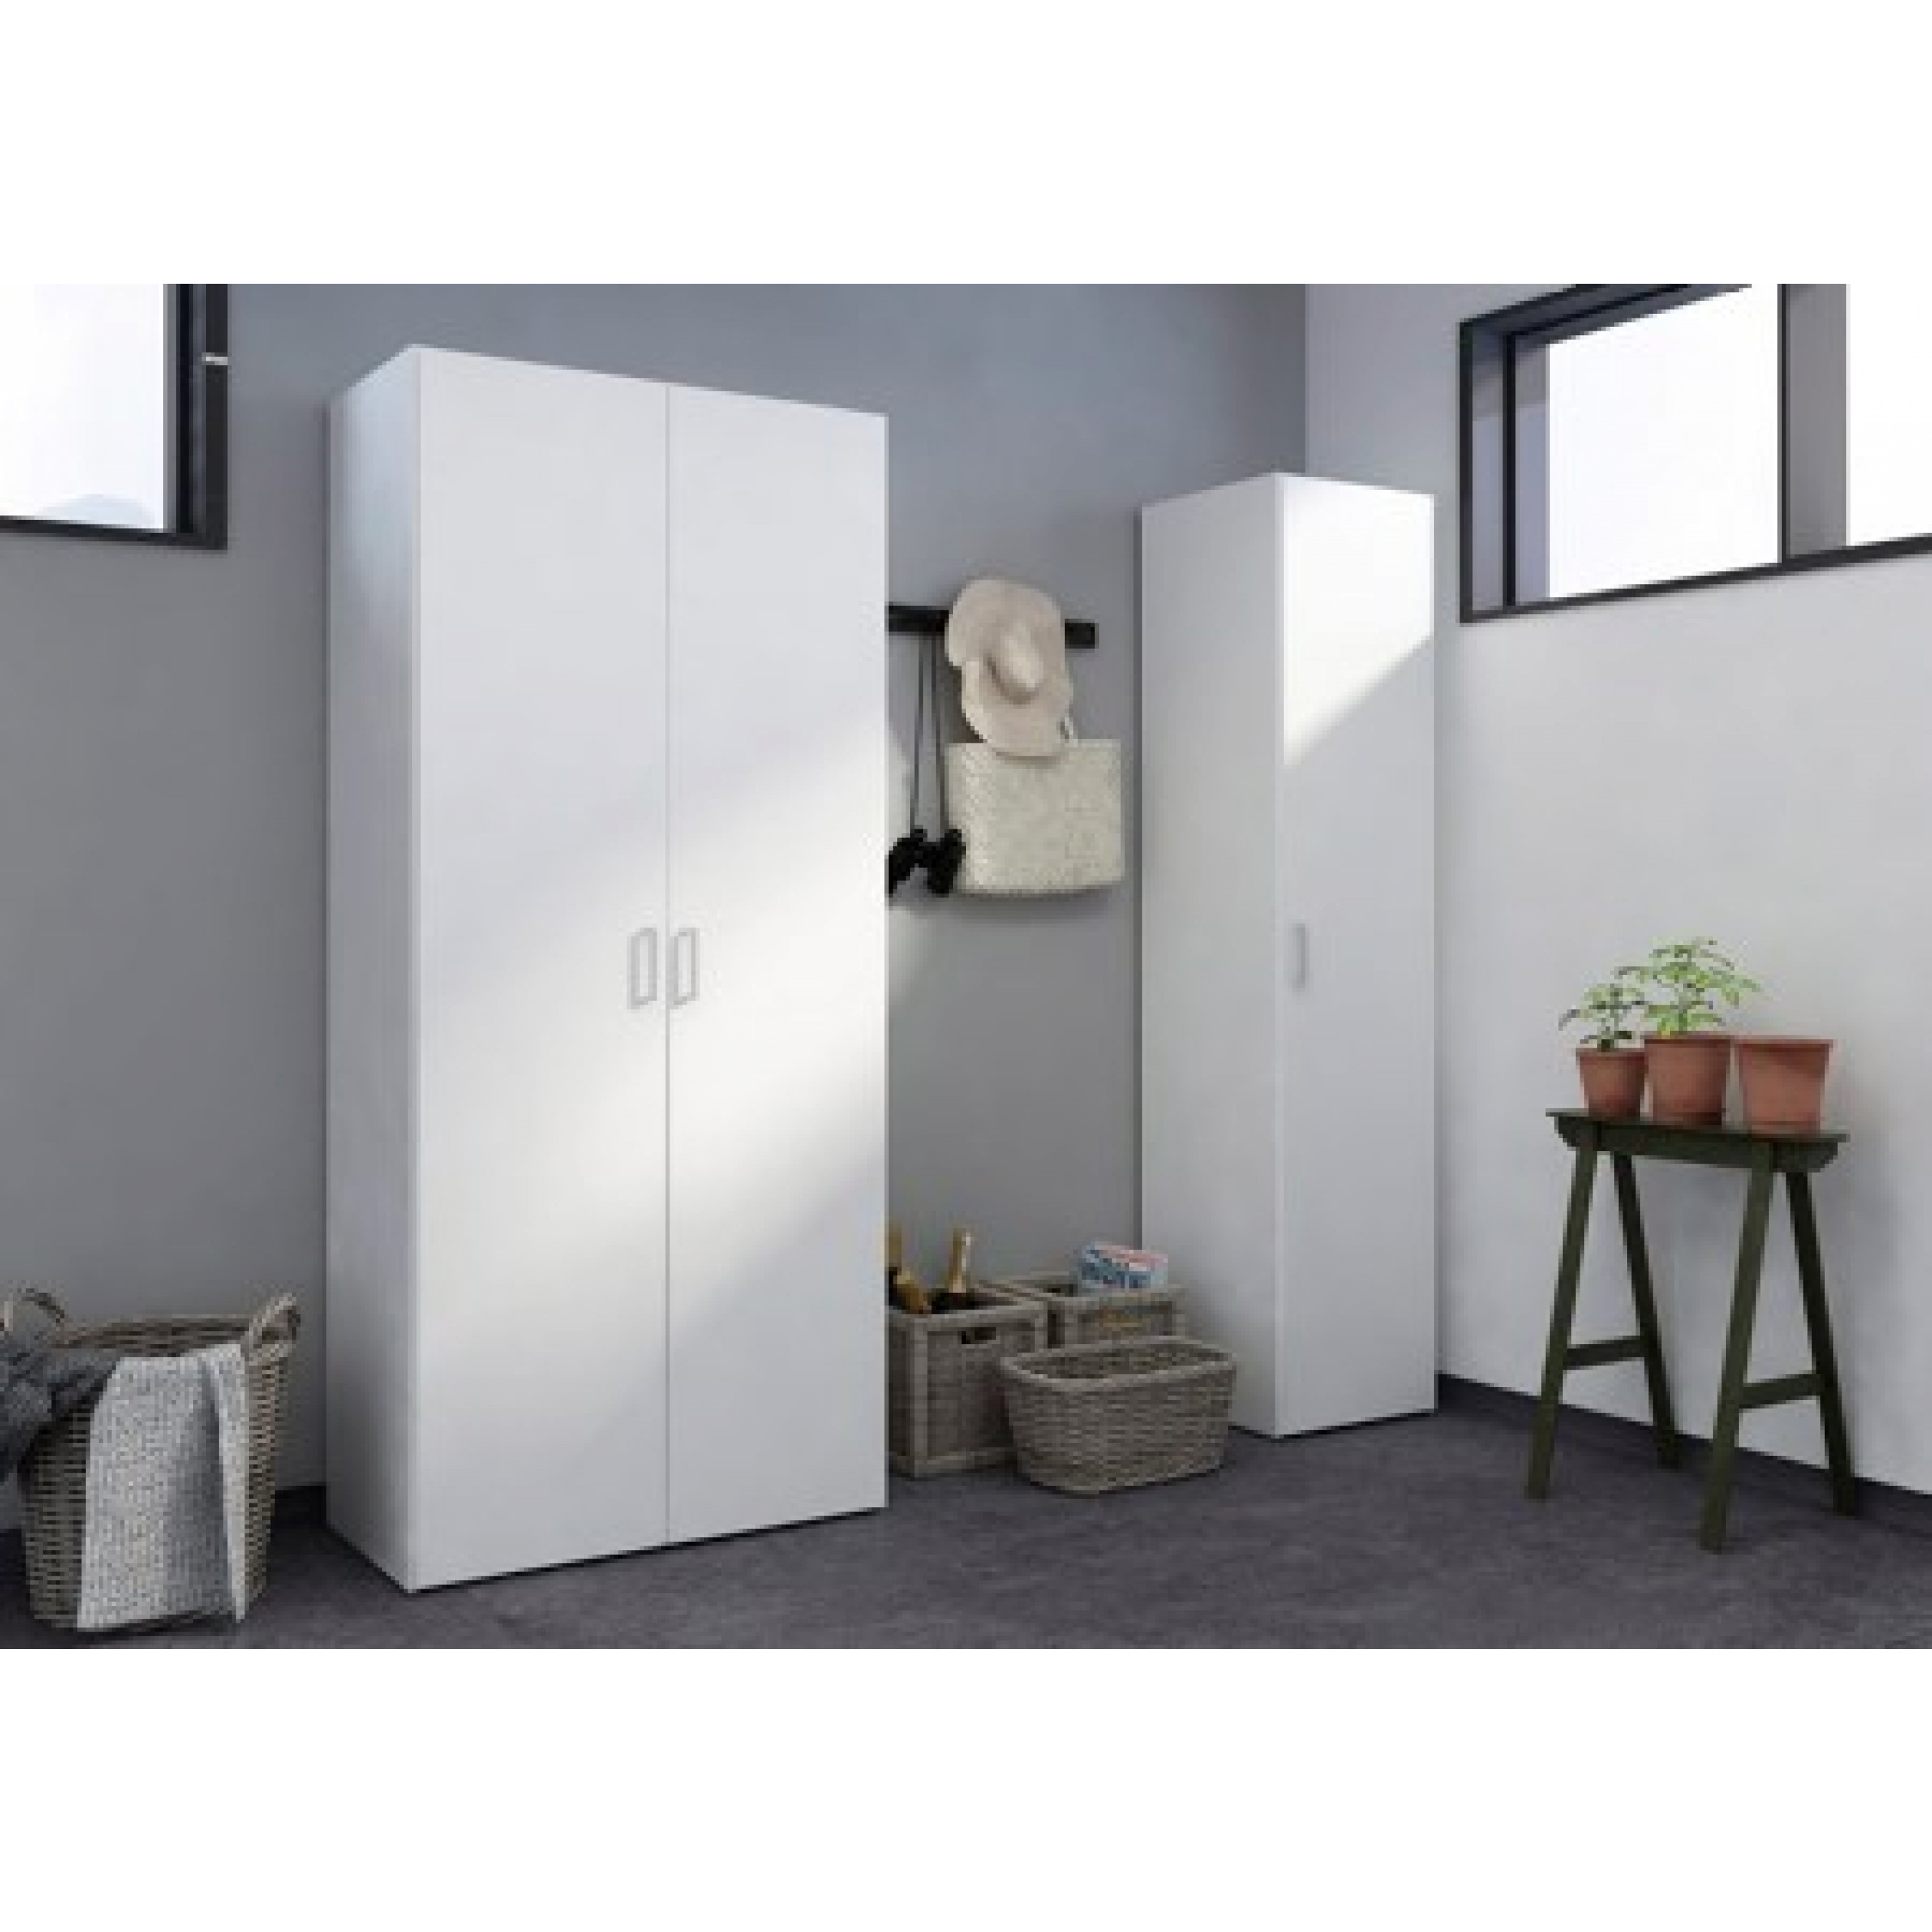 Wardrobe with 2 Doors & 5 Shelves | White